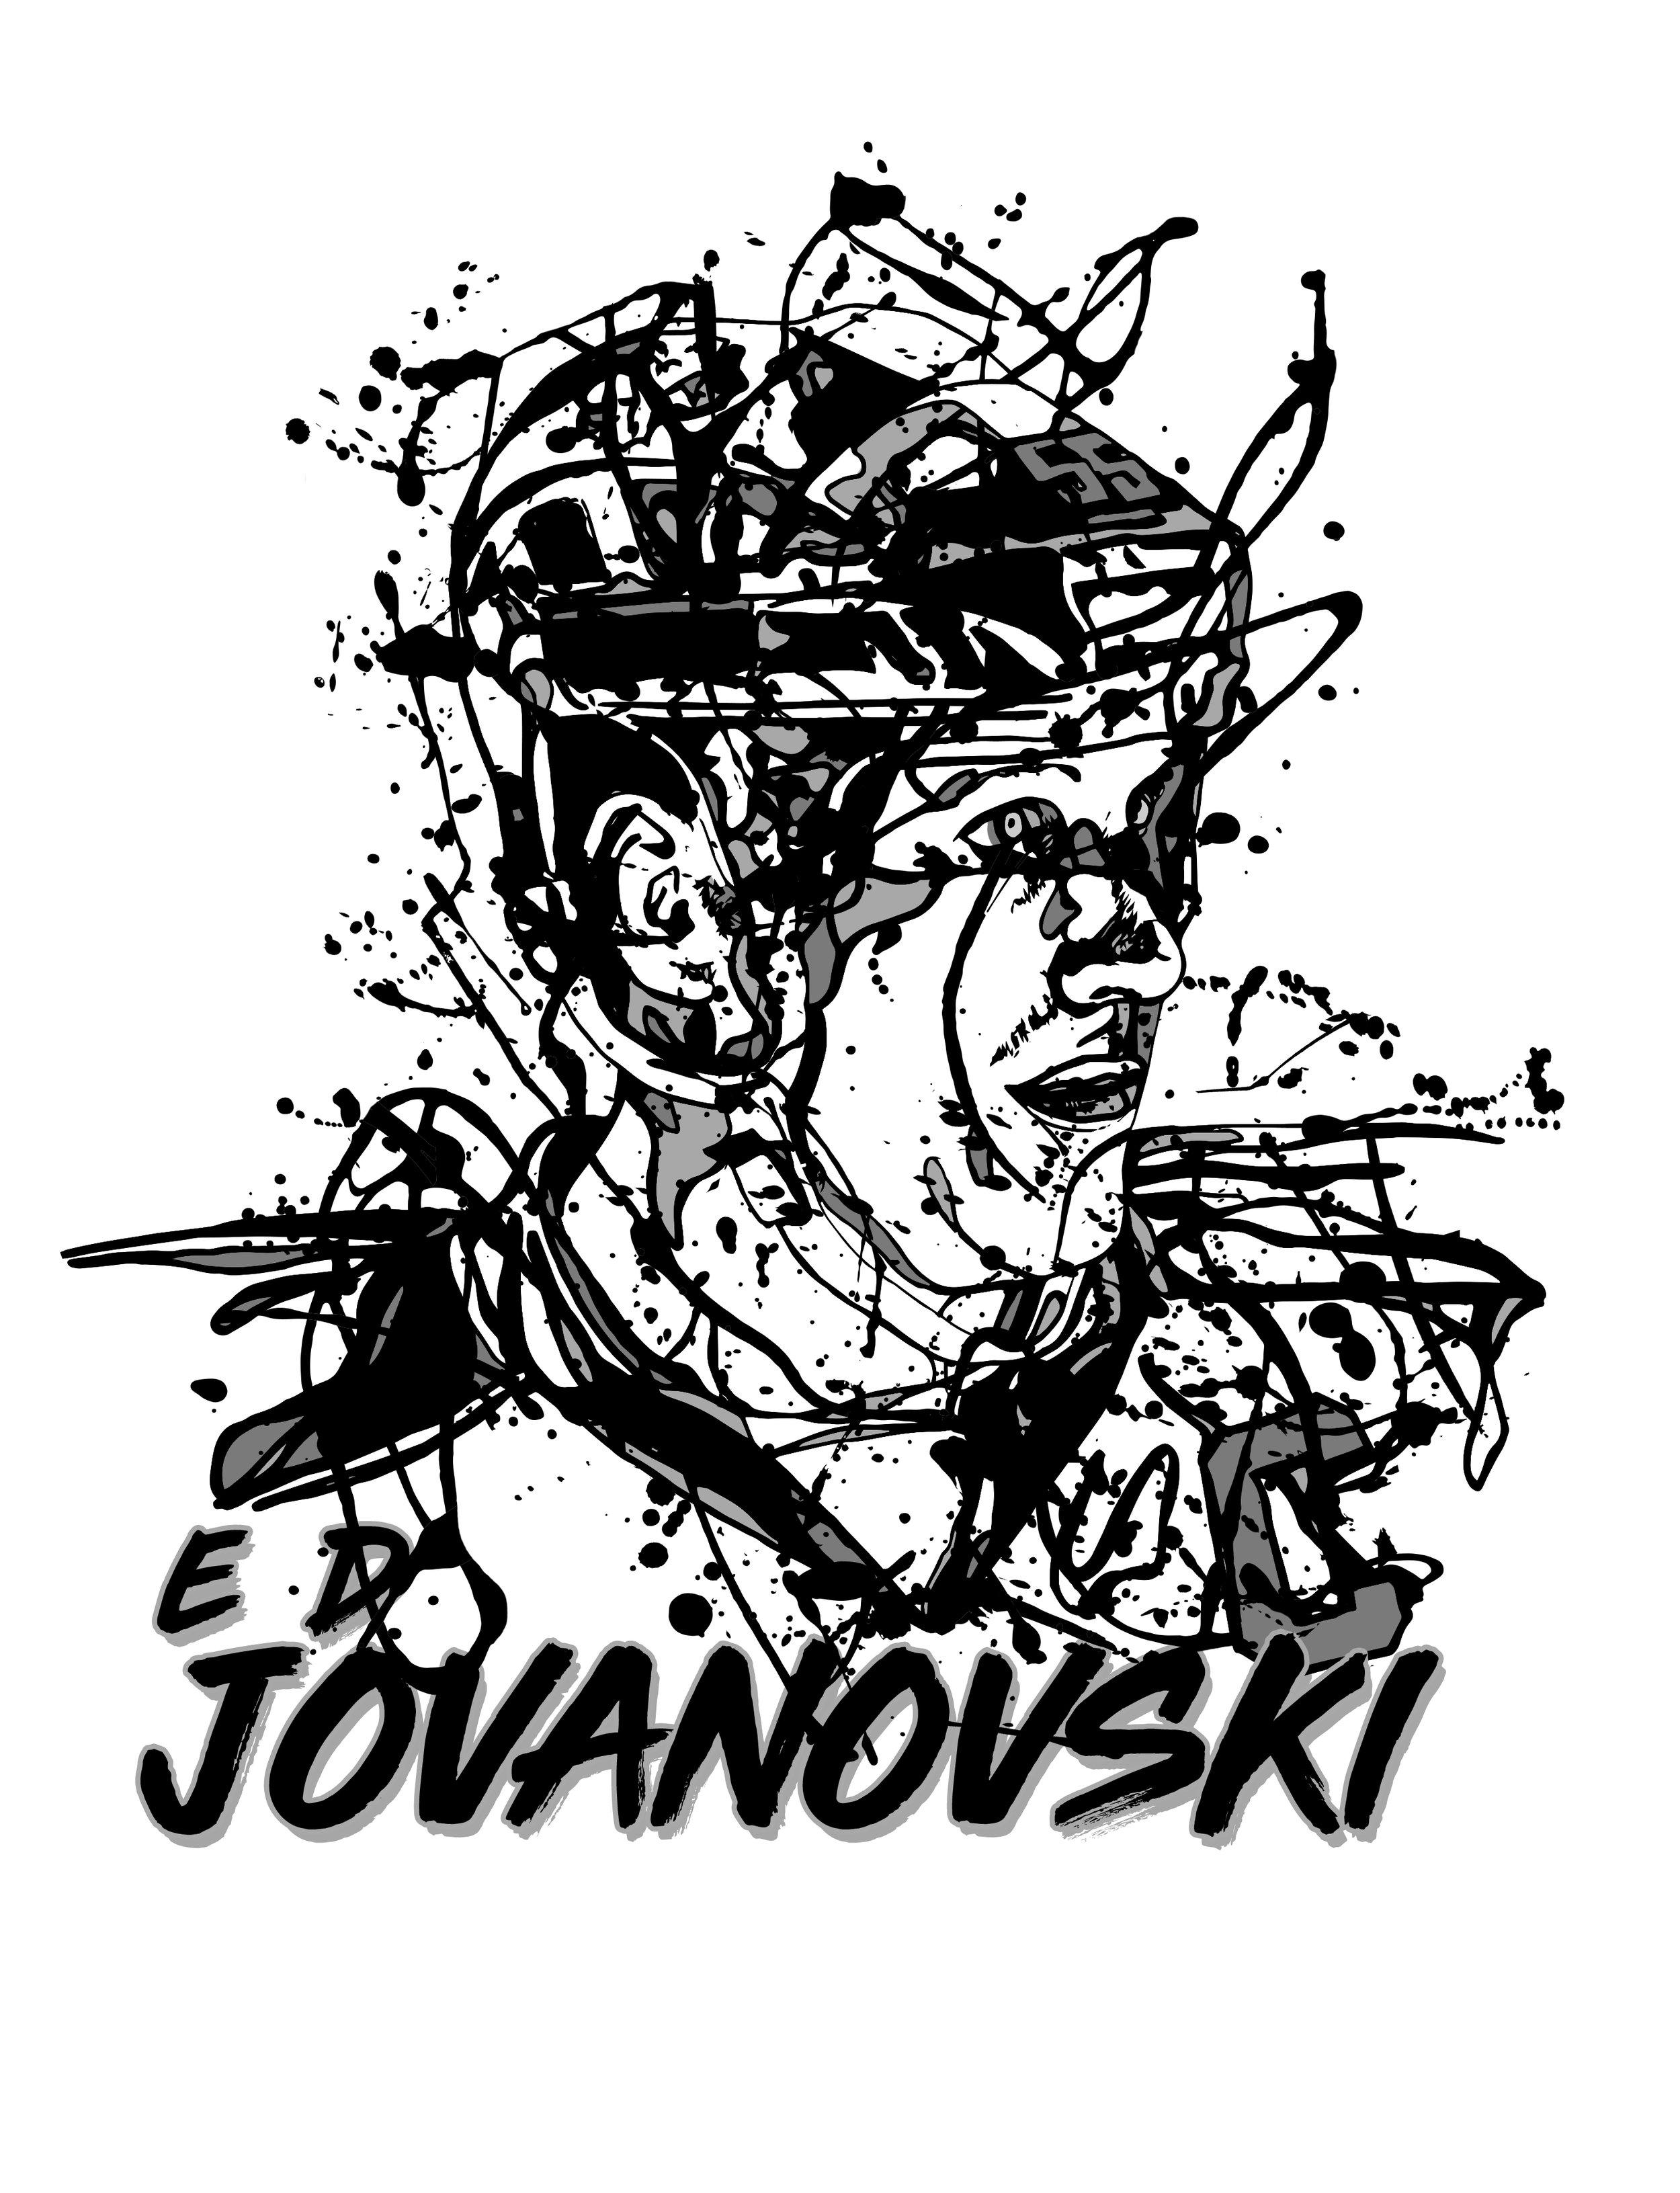 FLPA_Ed_Jovanovski_Legacy_Shirt_Design_Proof.jpg